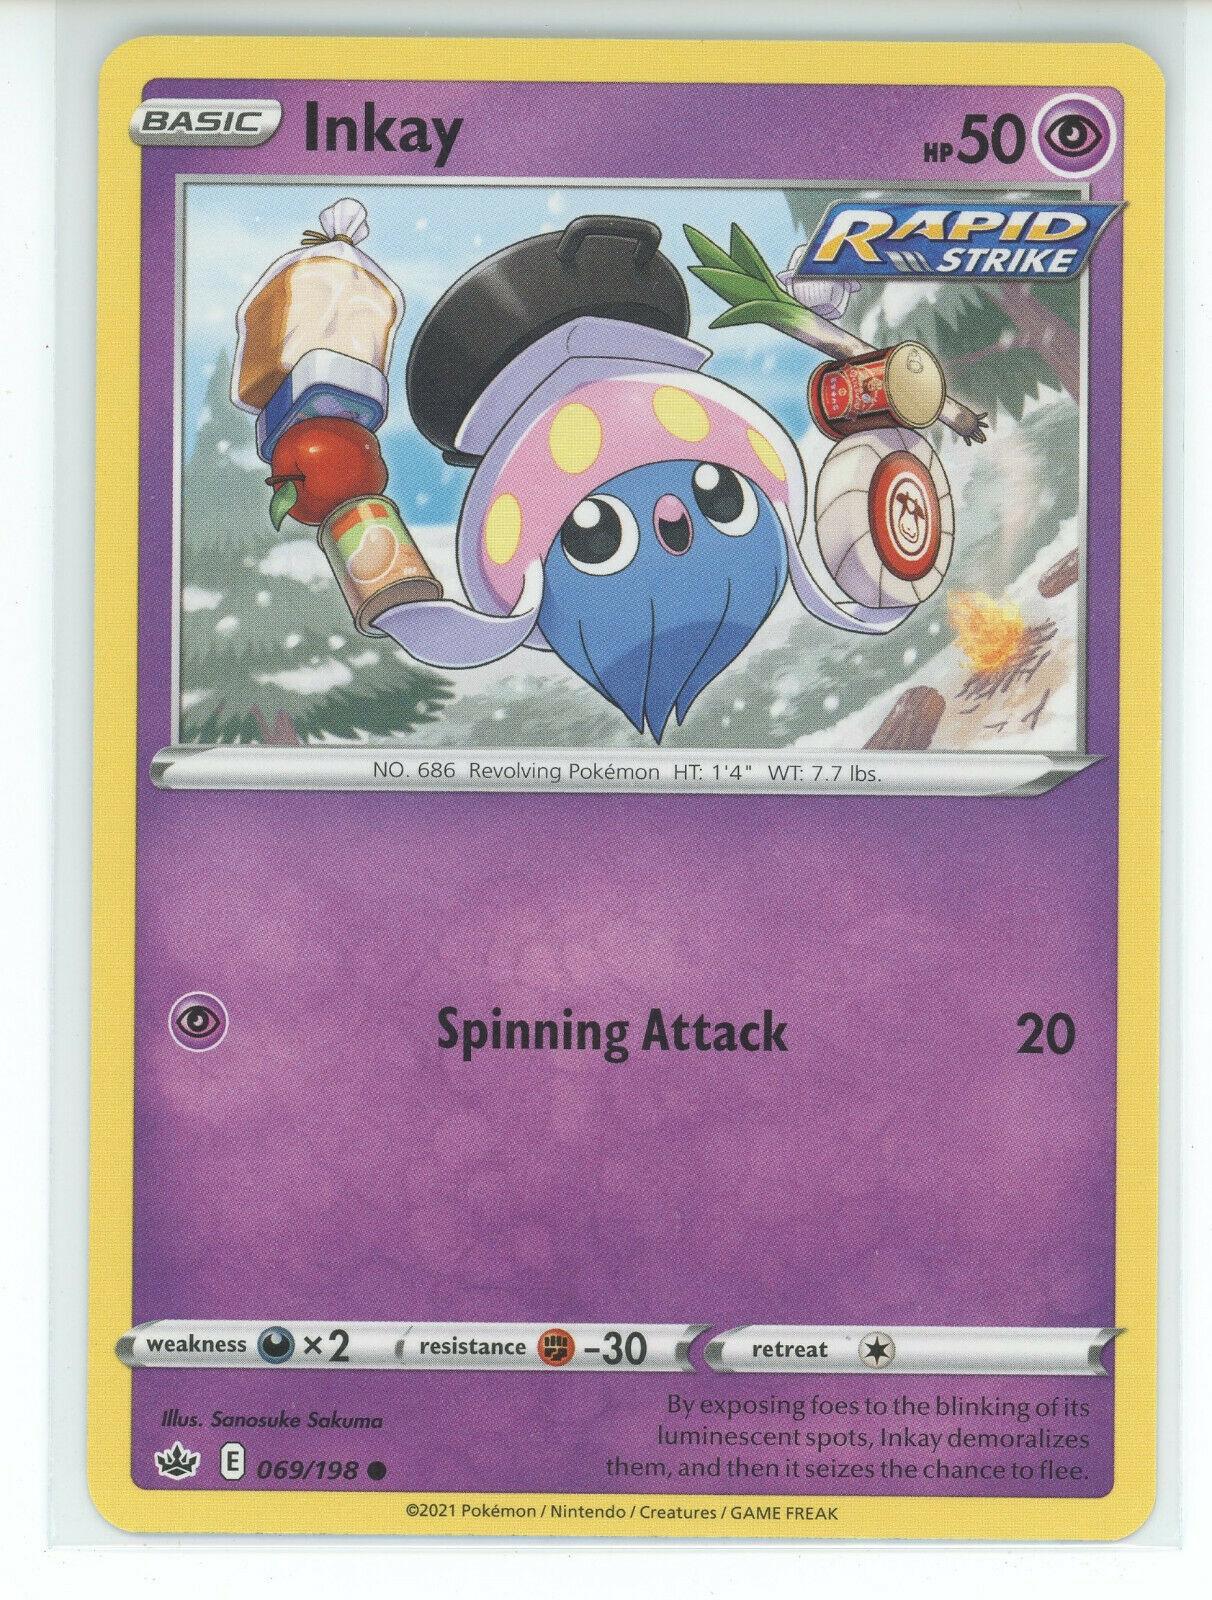 Pokemon 2021 S&S Chilling Reign Inkay 069/198 Rapid Strike Common